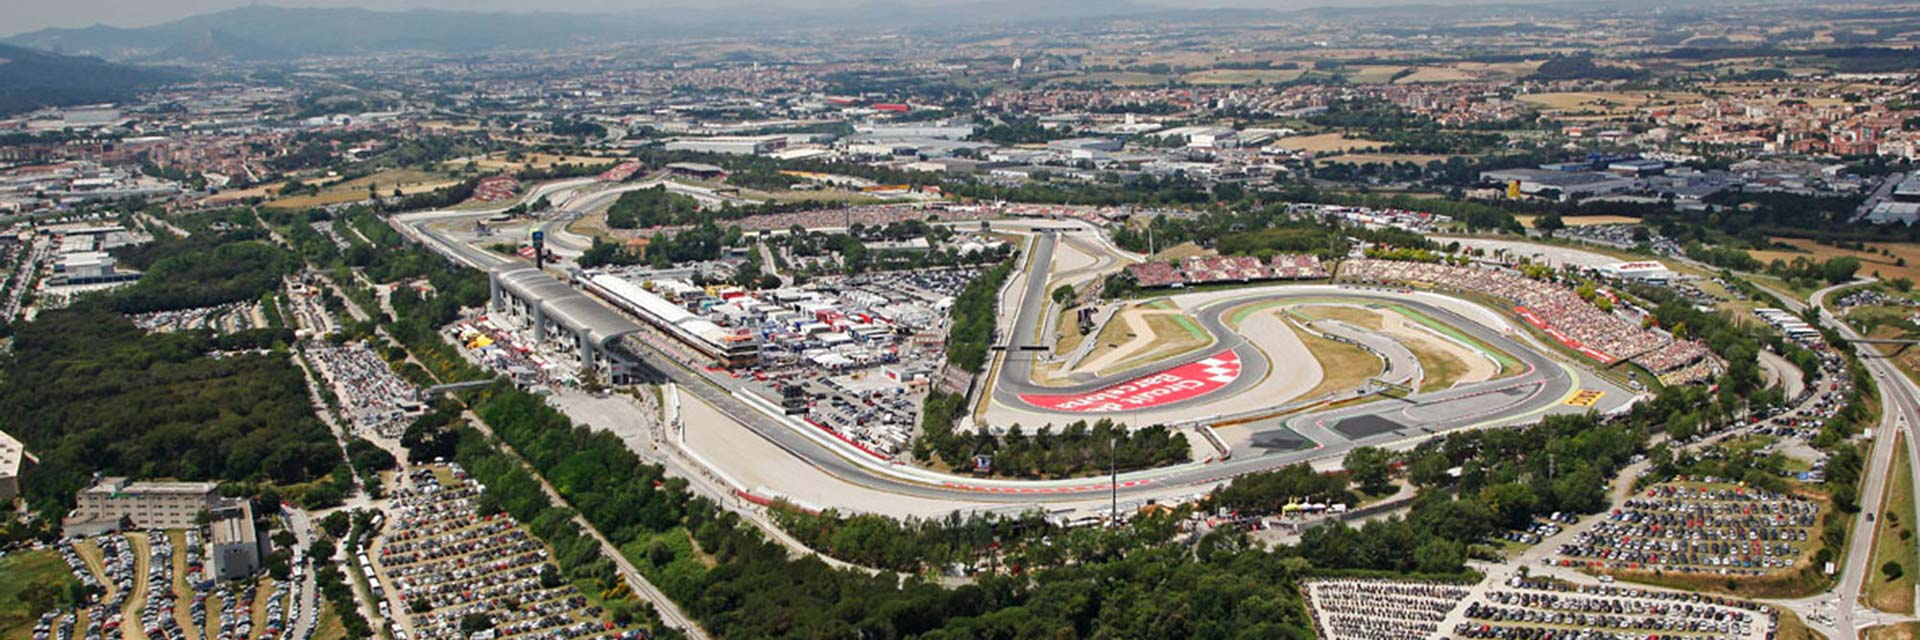 GEDLICH Racing - Racetrack Circuito Barcelona Catalunya